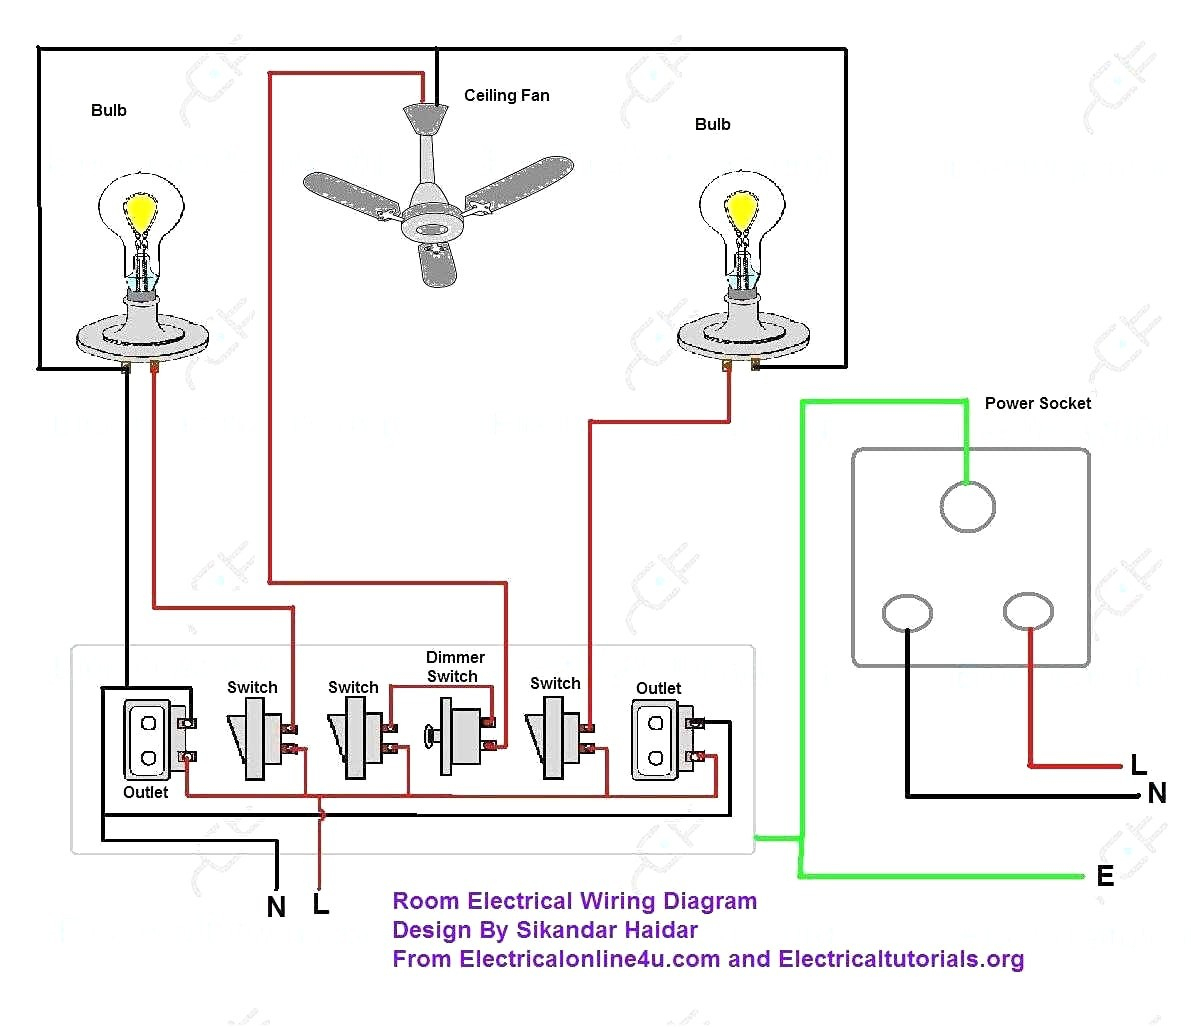 Home Wiring | Wiring Diagram - Electric Heater Wiring Diagram